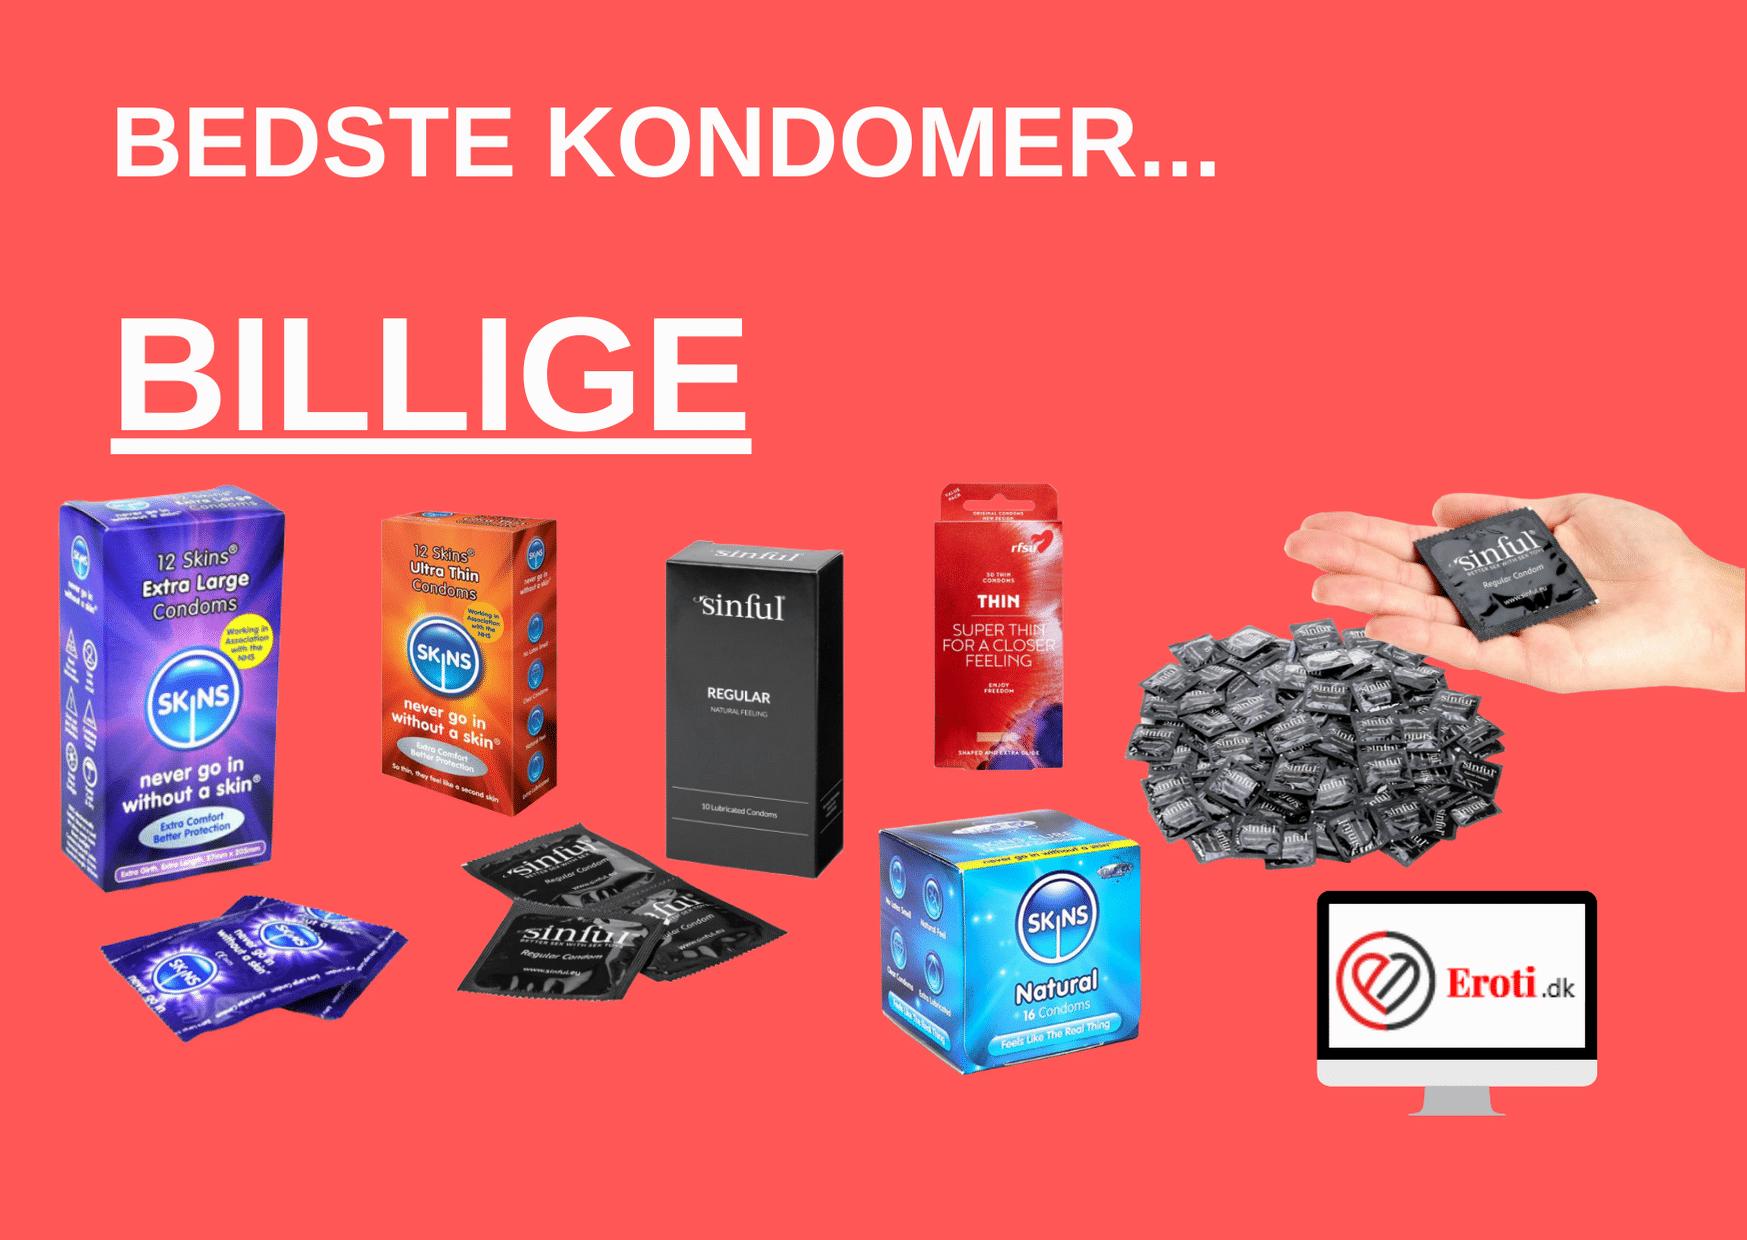 billige kondomer